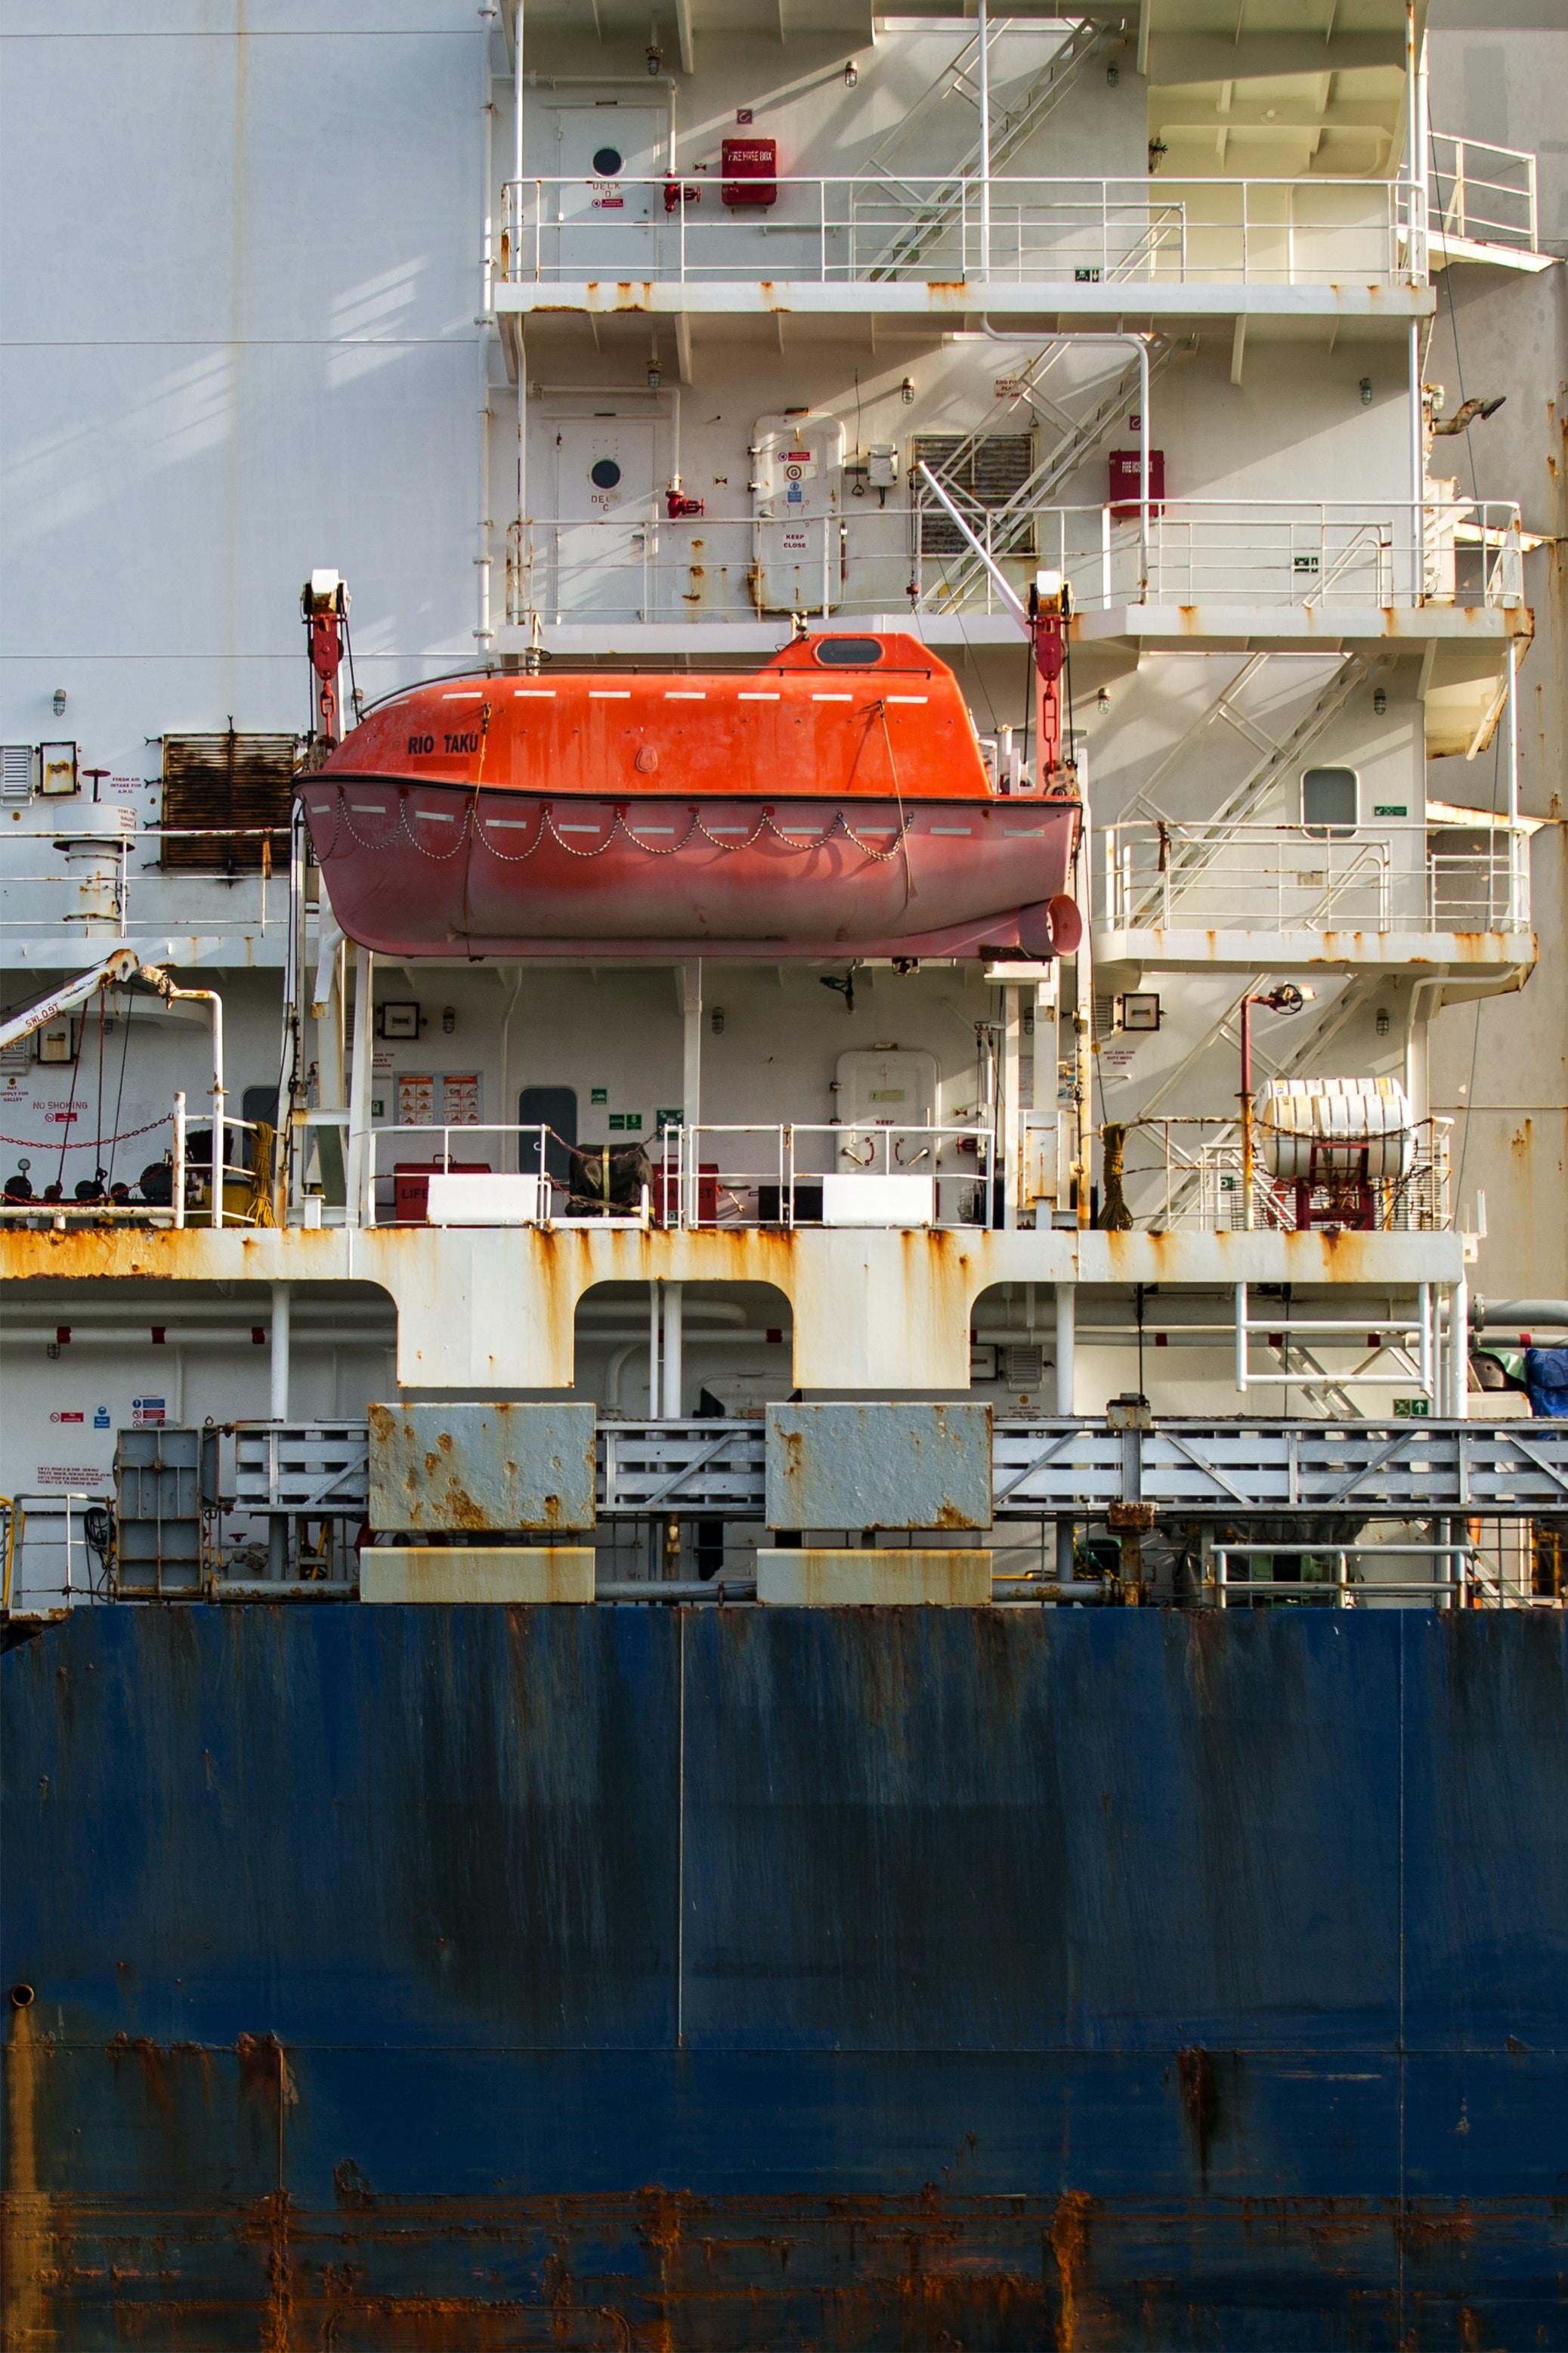 low angle photo ofwhite concrete boat